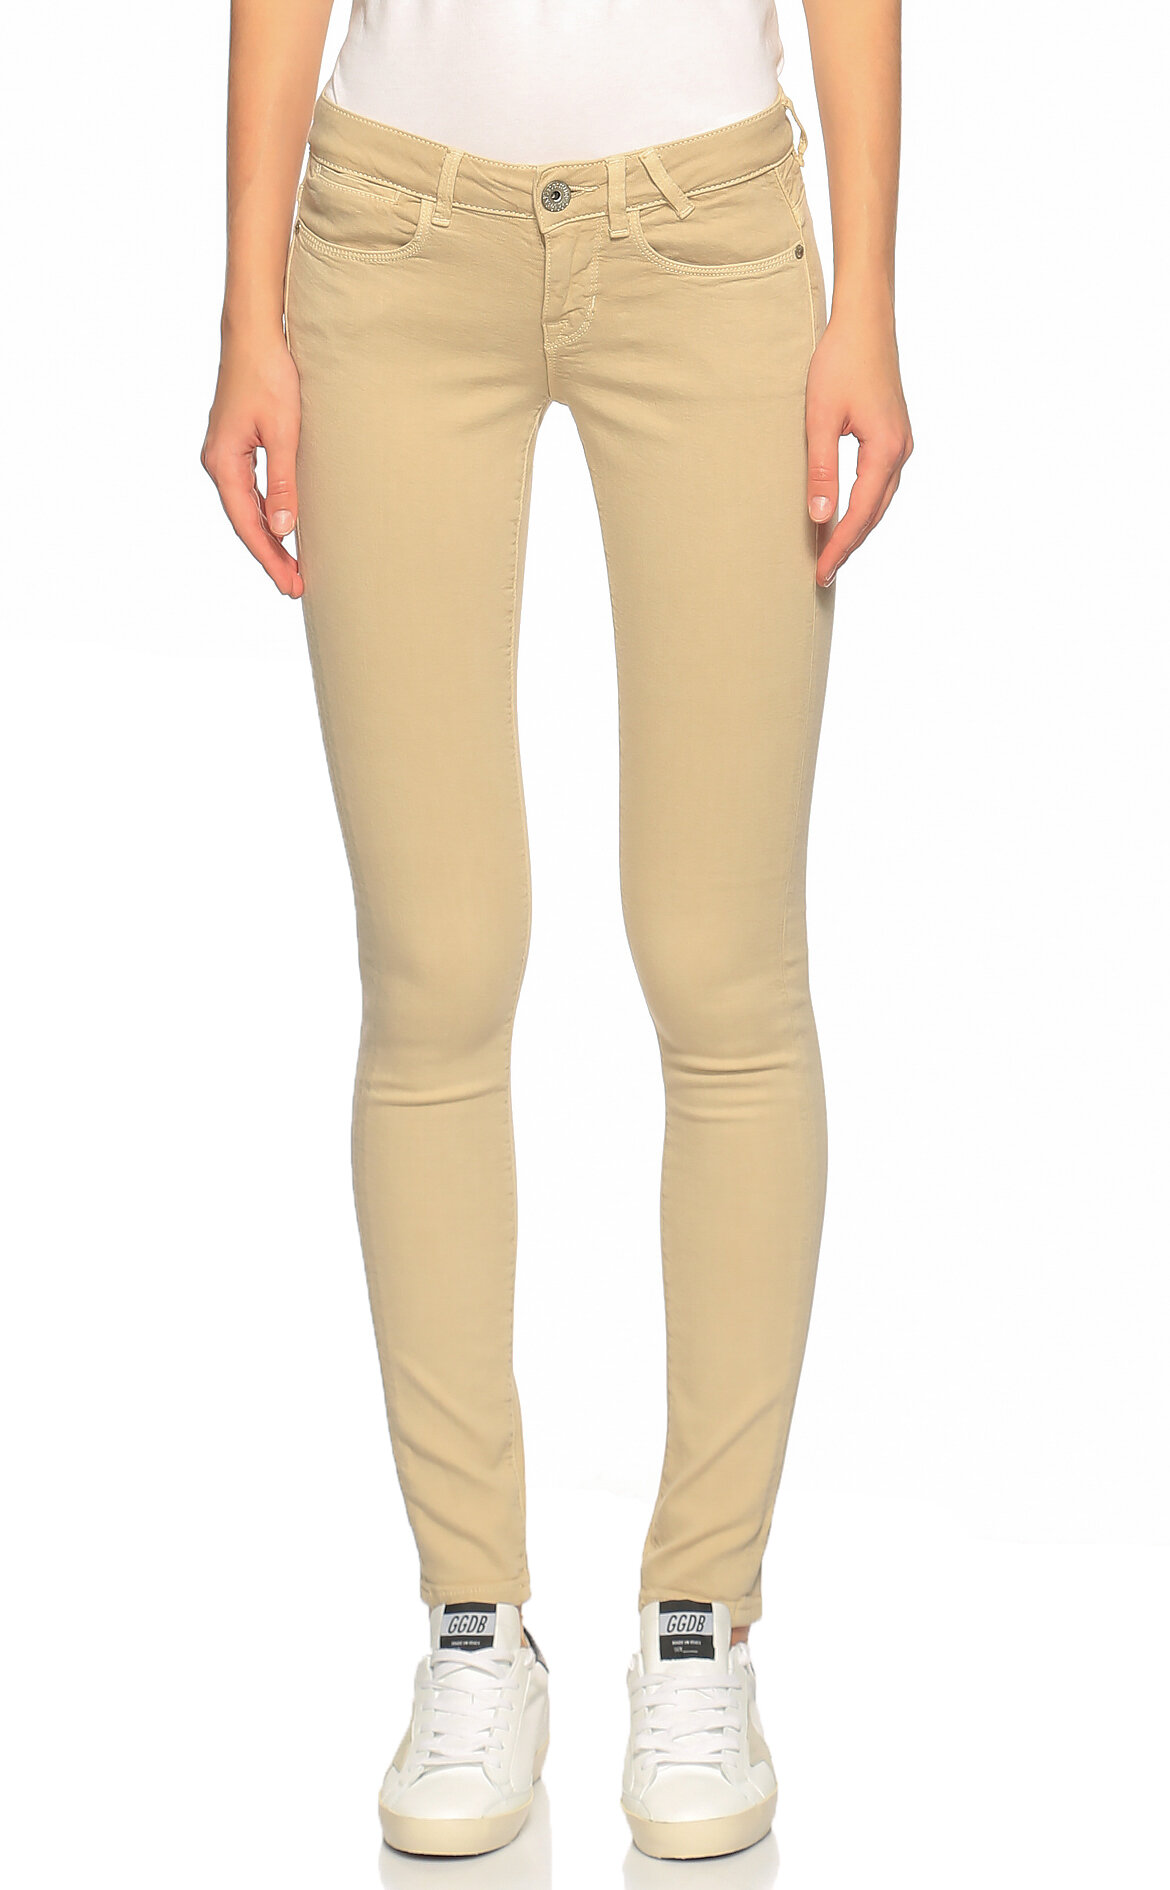 Guess-Guess Skinny Ekru Rengi Pantolon